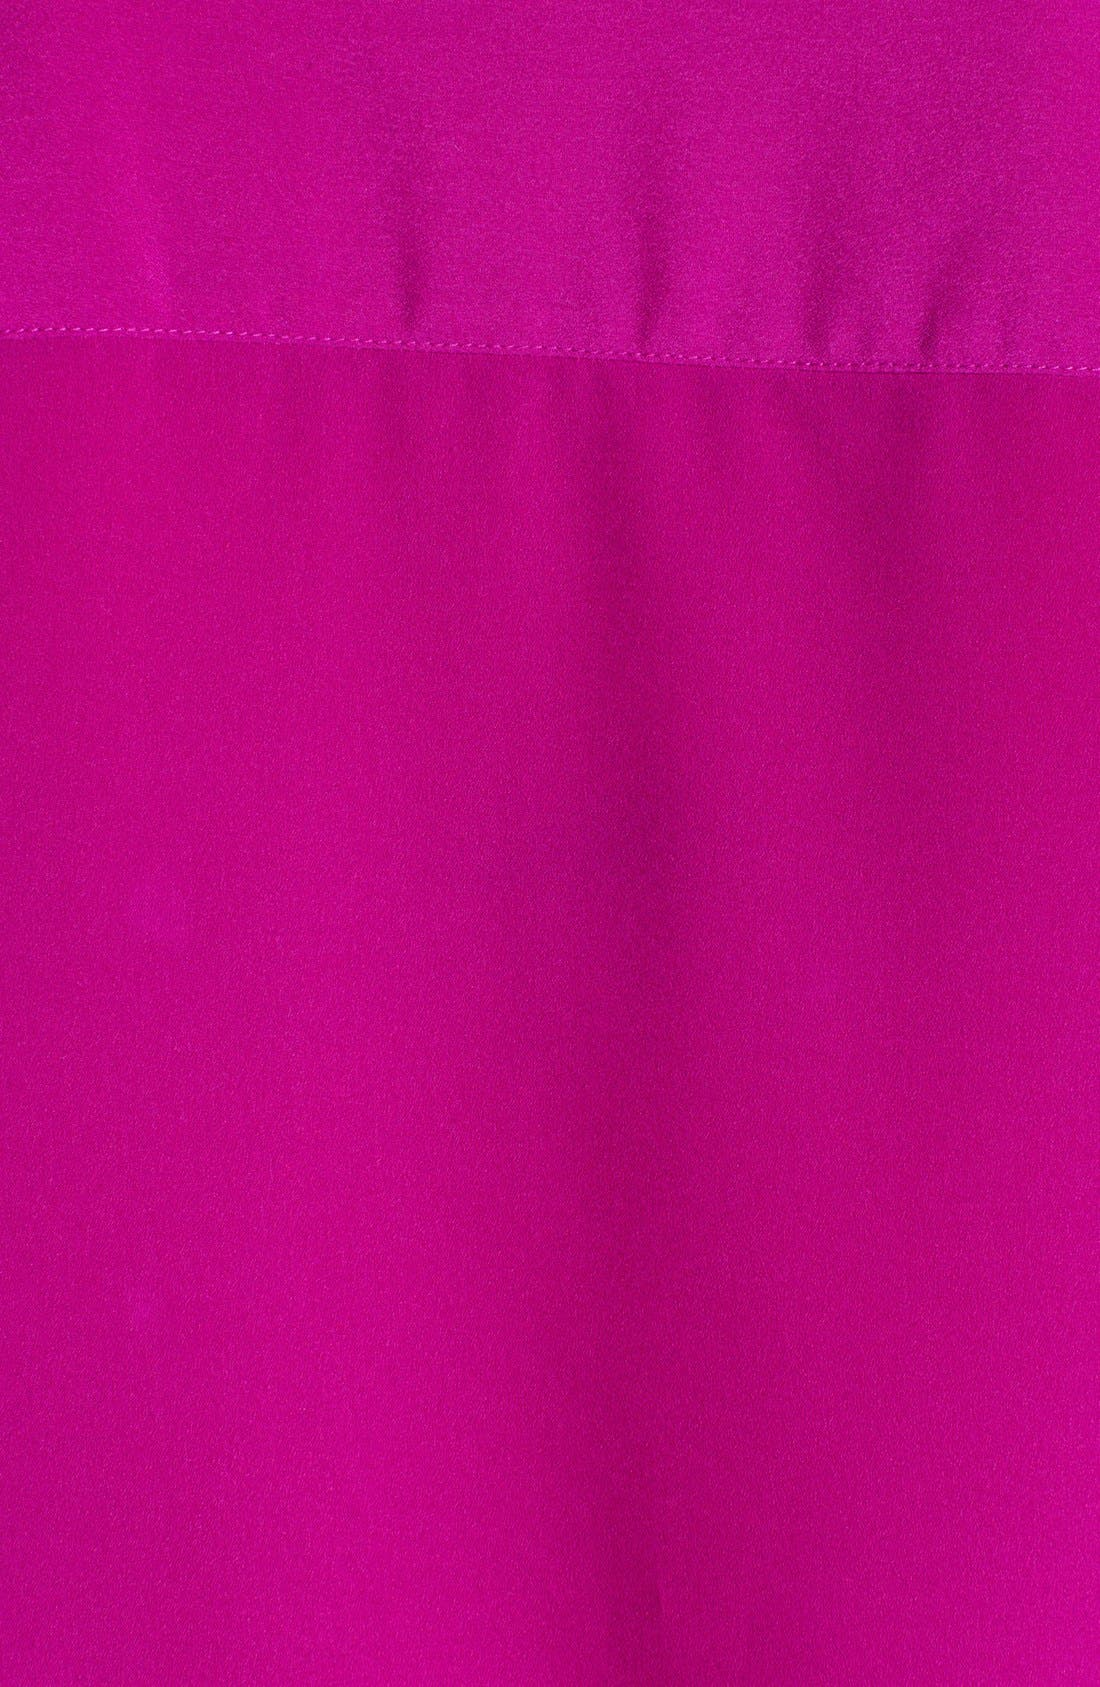 Alternate Image 3  - Anne Klein V-Neck Shirt (Petite)